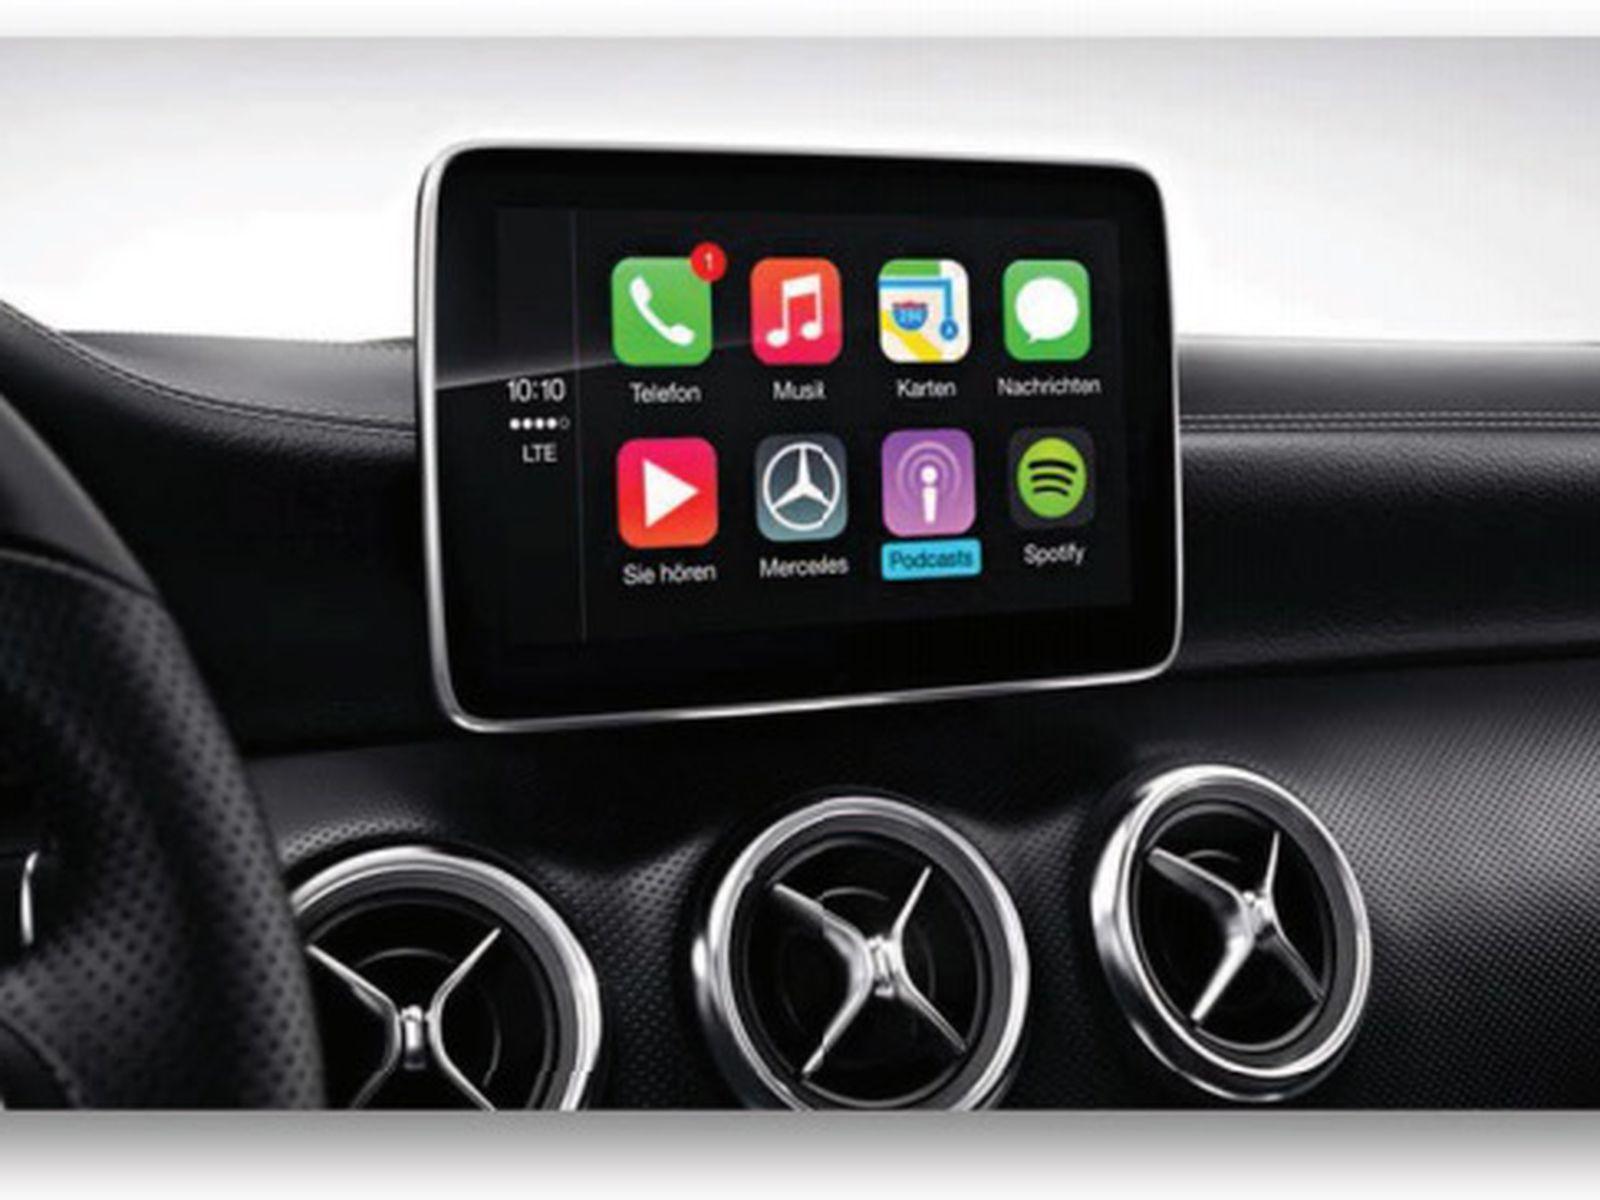 Mercedes Benz Shares Full Lineup Of 2016 U S Carplay Vehicles Macrumors